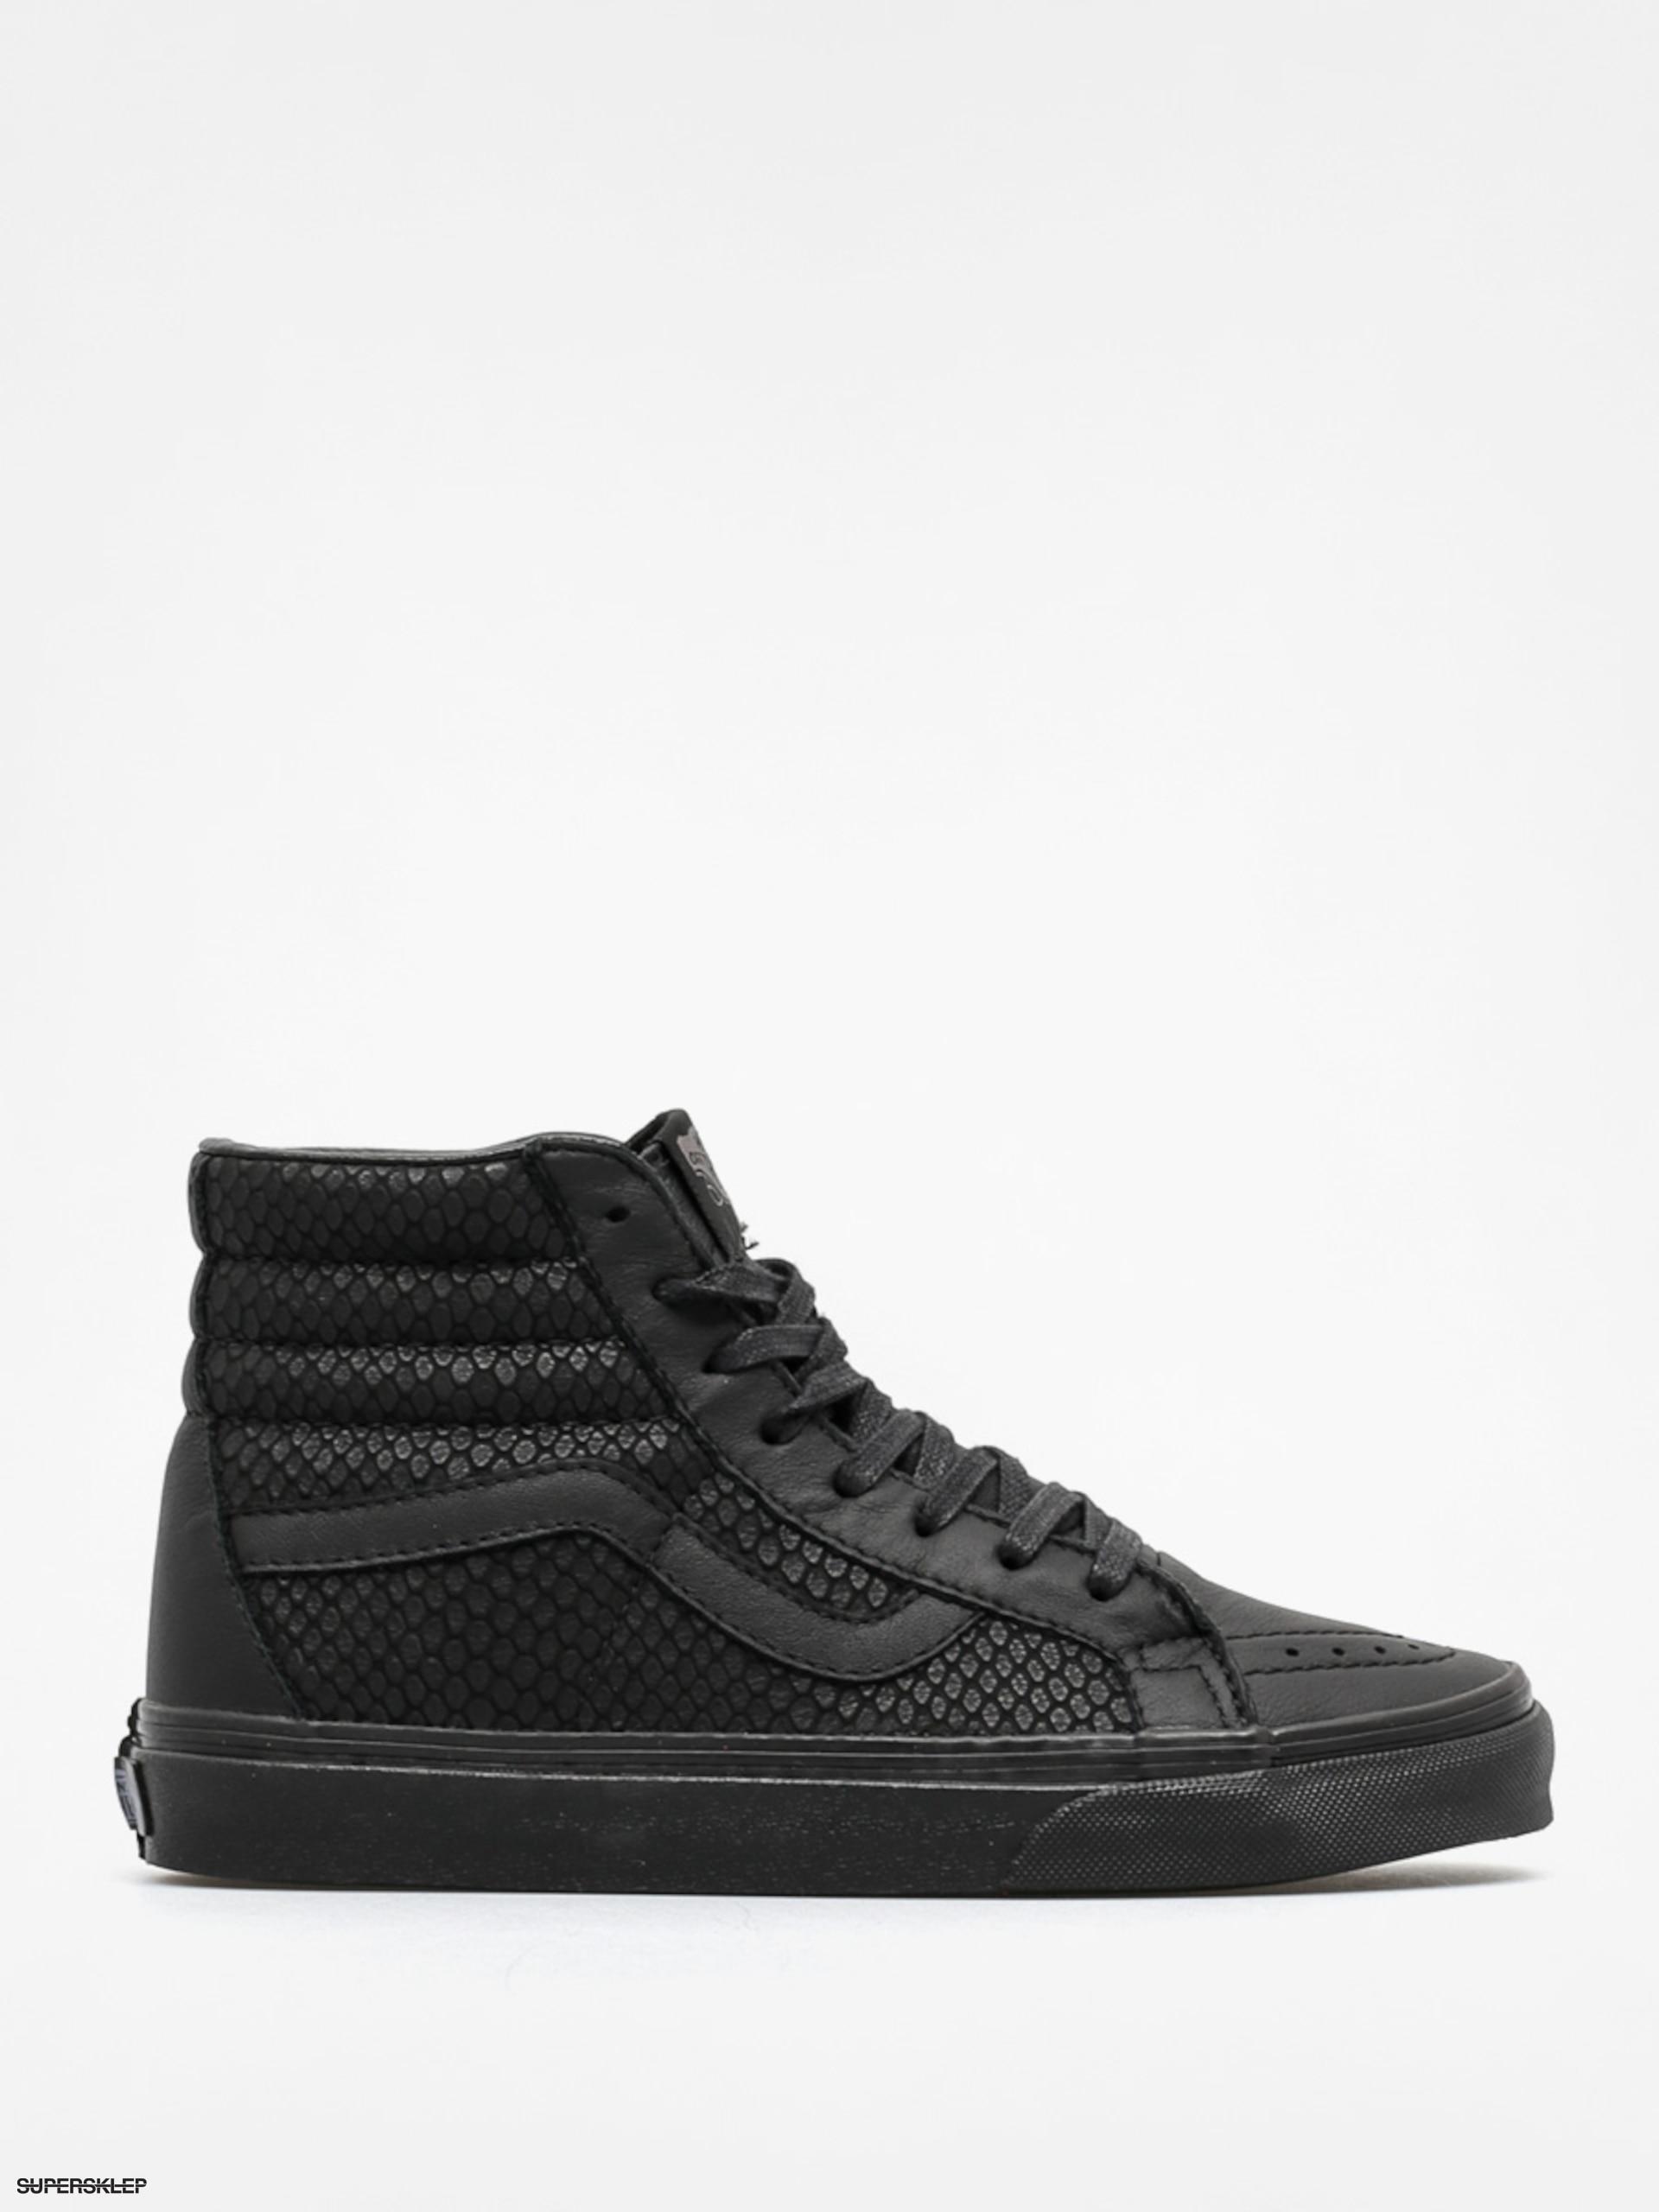 Vans SK8 HI Sneakersy wysokie black Skóra i materiał